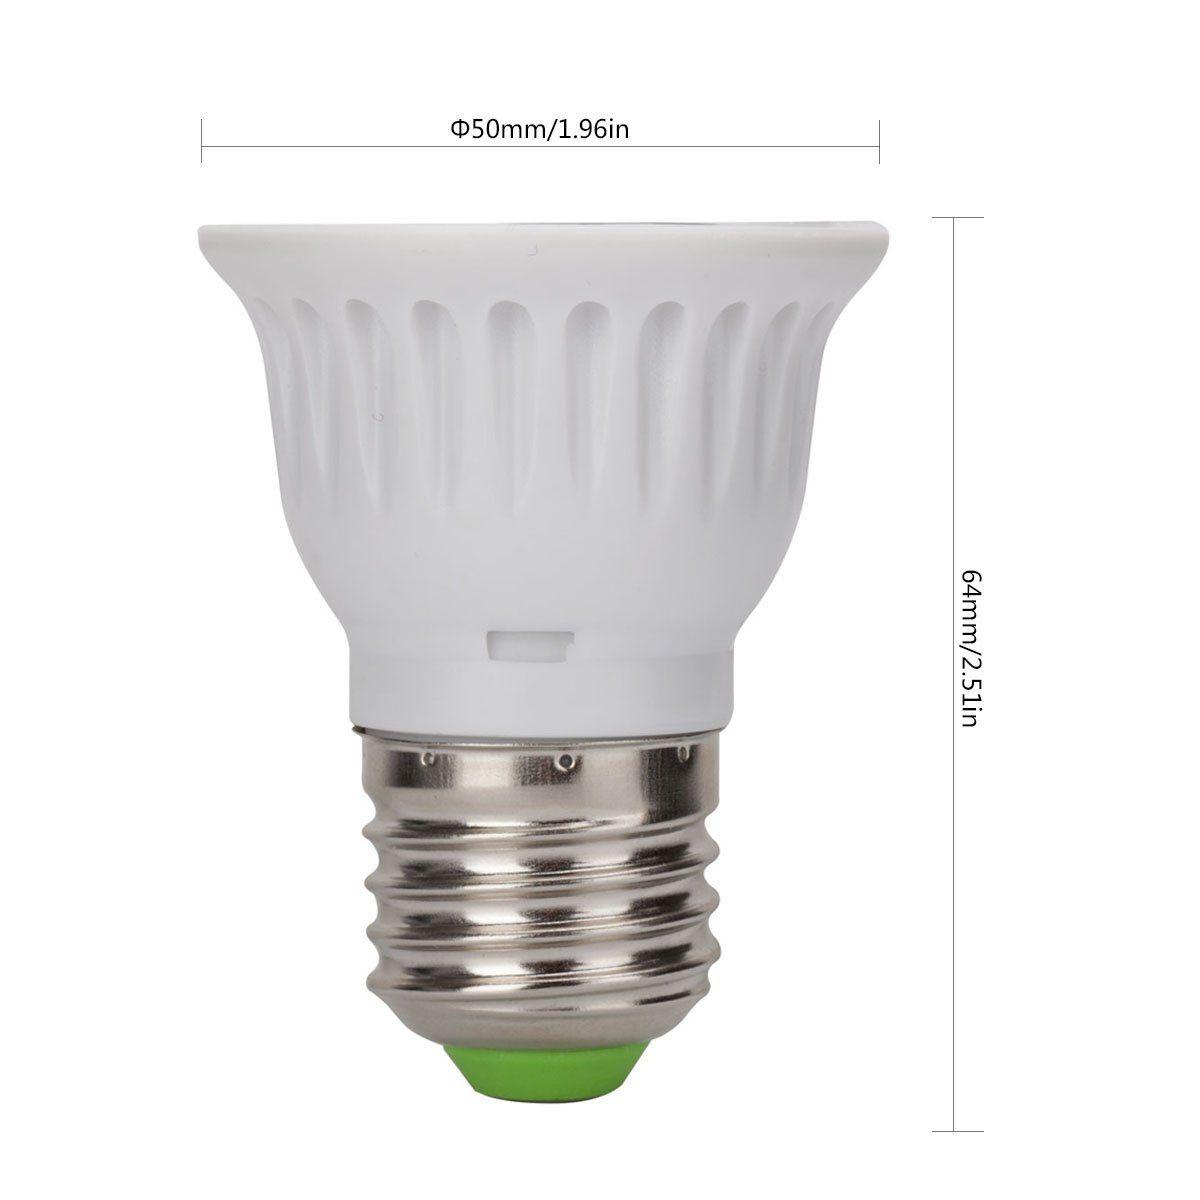 Chichinlighting Rgb E26 Spotlight With Remote Control Dimmable E26 E27 Led Bulbs3w Rgb Color Changing Spotlight With Ir R Ambiance Lighting Light Bulb Led Bulb